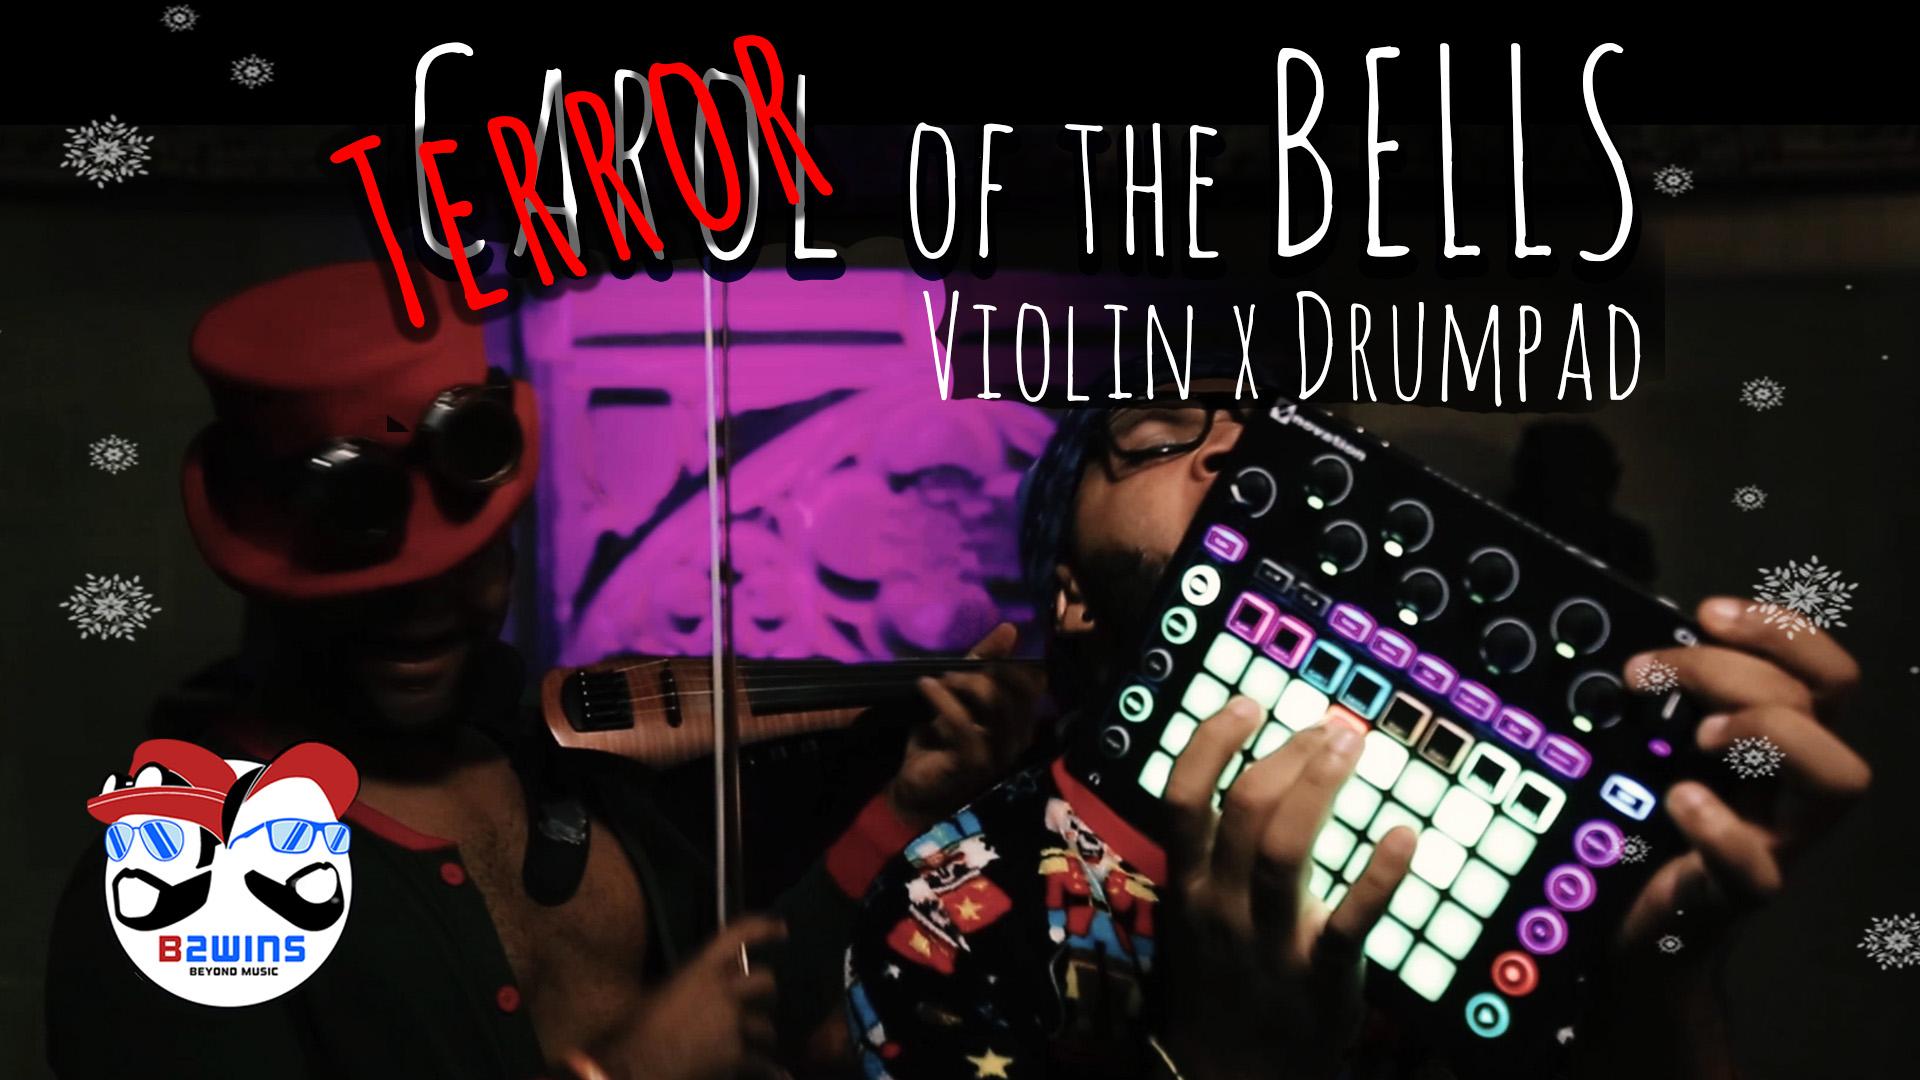 B2wins Terror of the Bells Carol of the Bells Hip Hop Violin